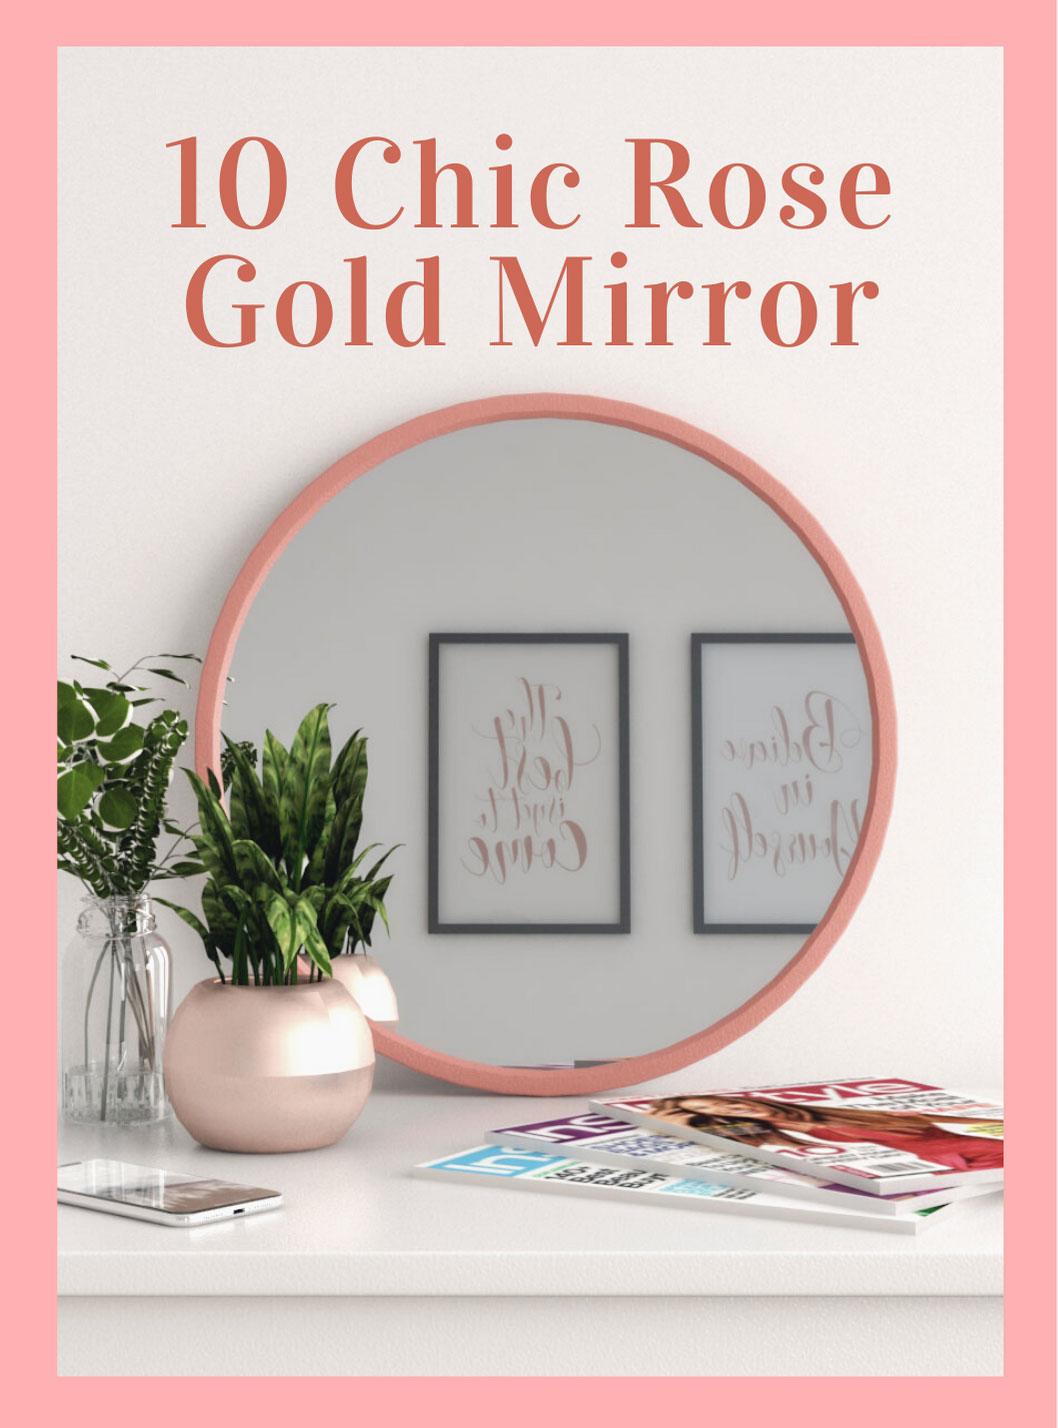 10 chic rose gold mirror